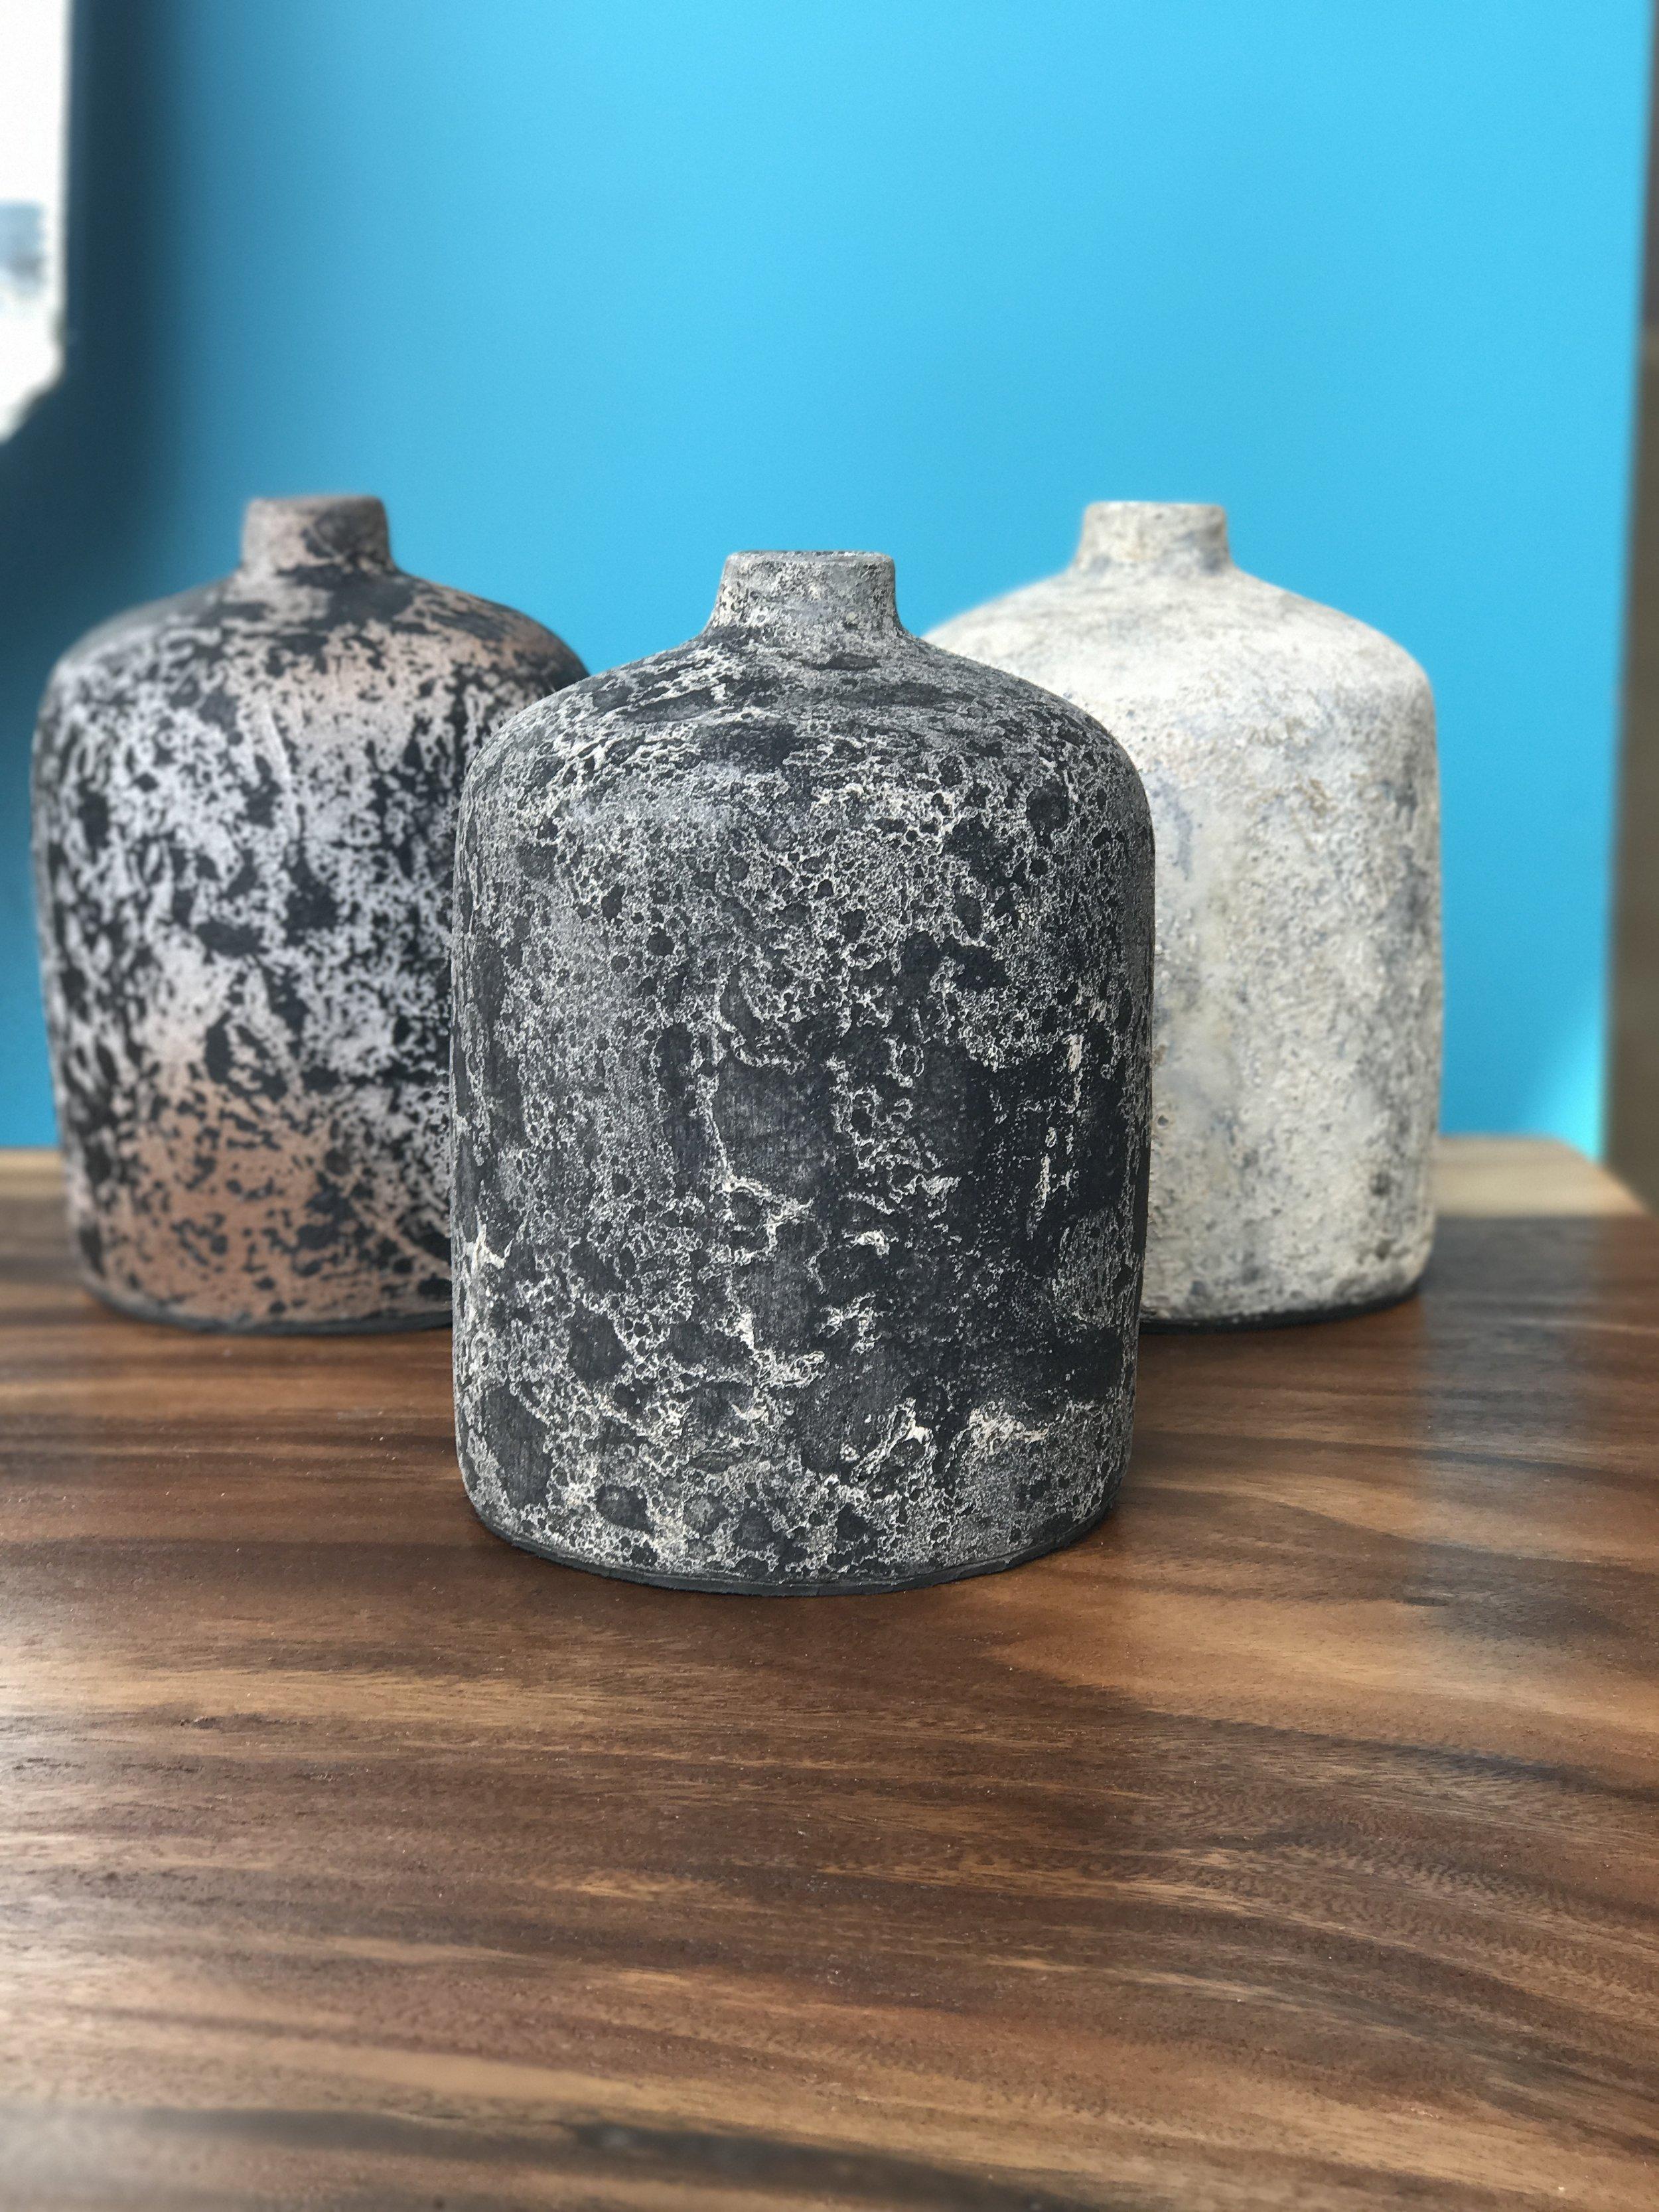 blue moon furniture, furniture store winnipeg. artifact pottery. bottles